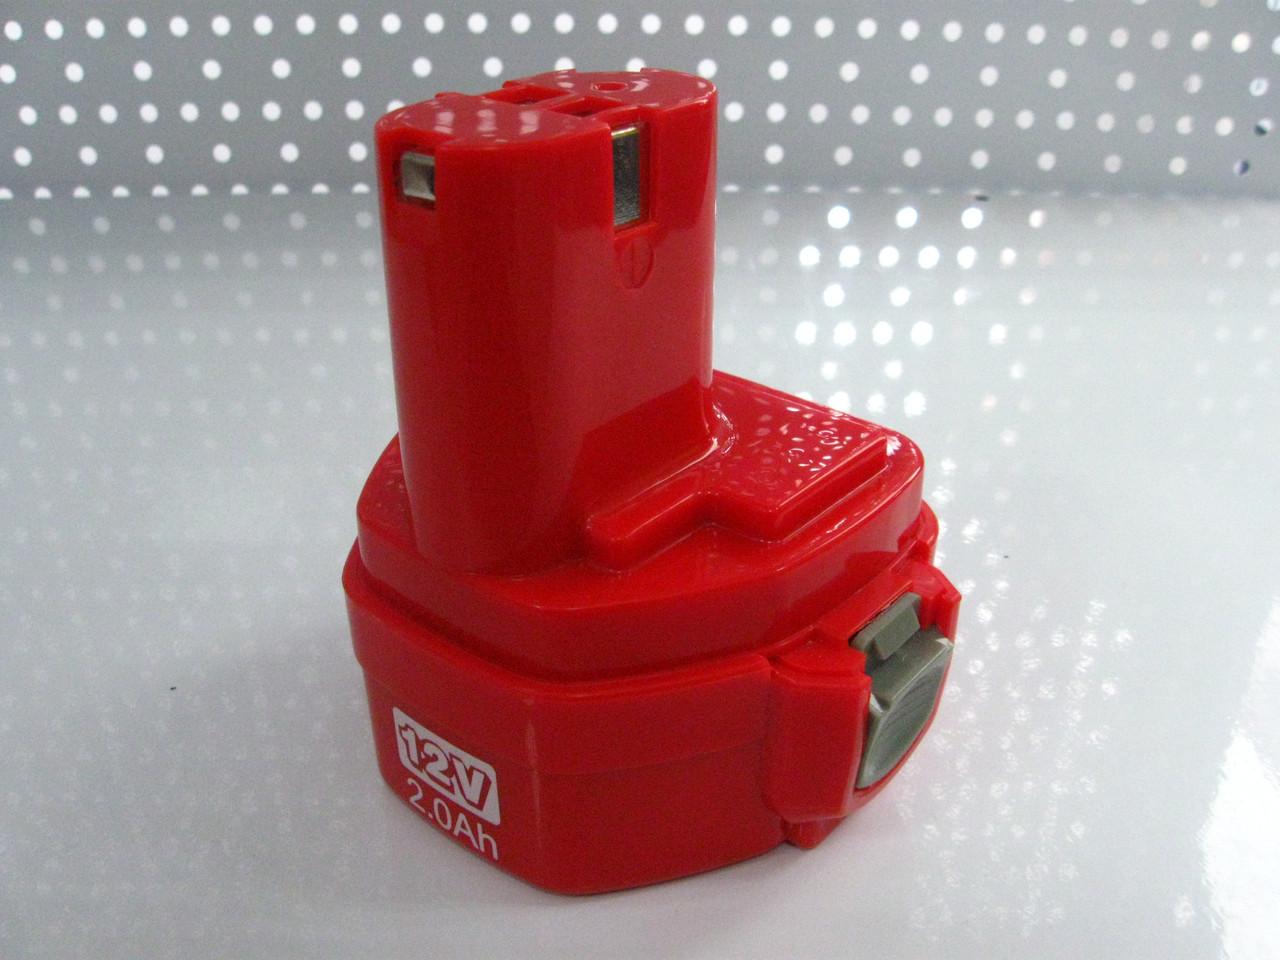 Аккумулятор шуруповерта Makita 12В 1,5 А/ч аналог